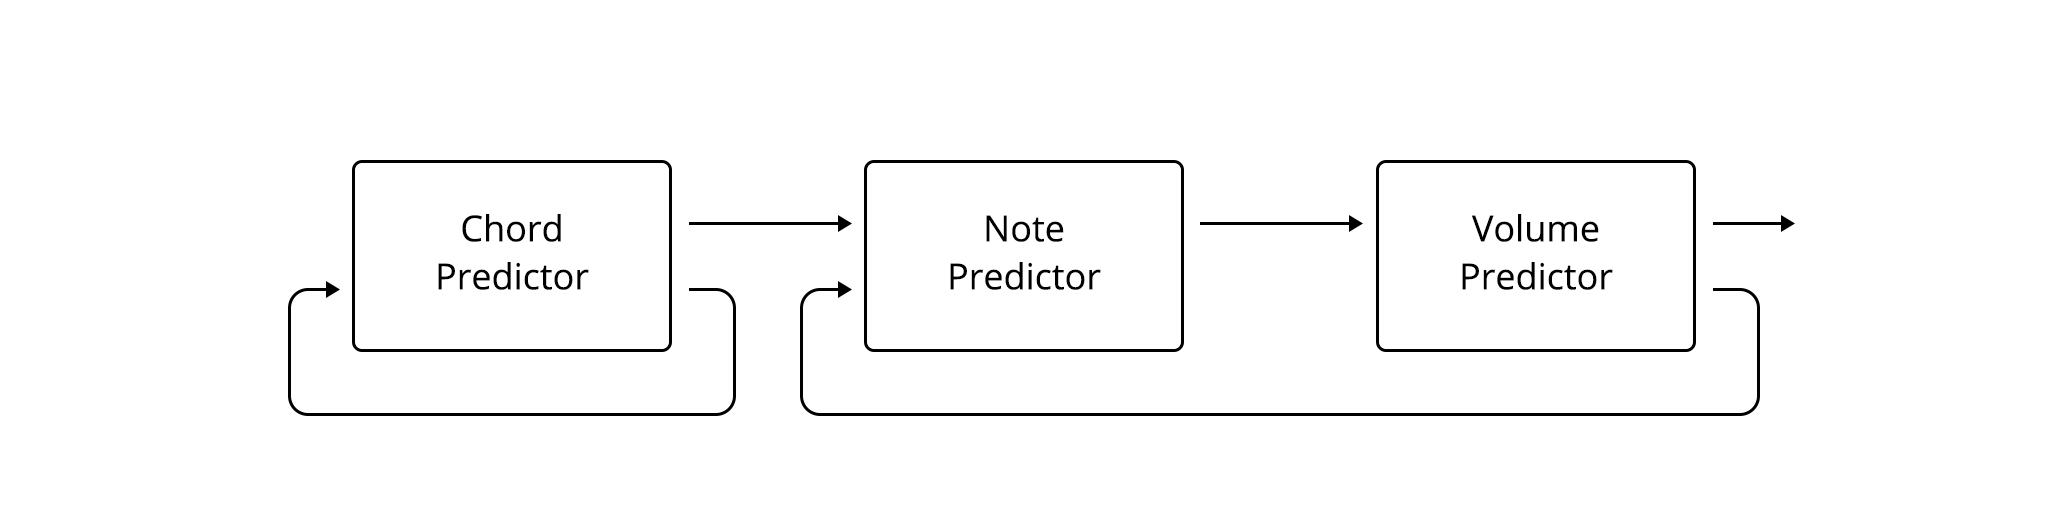 Illustration of the generative model